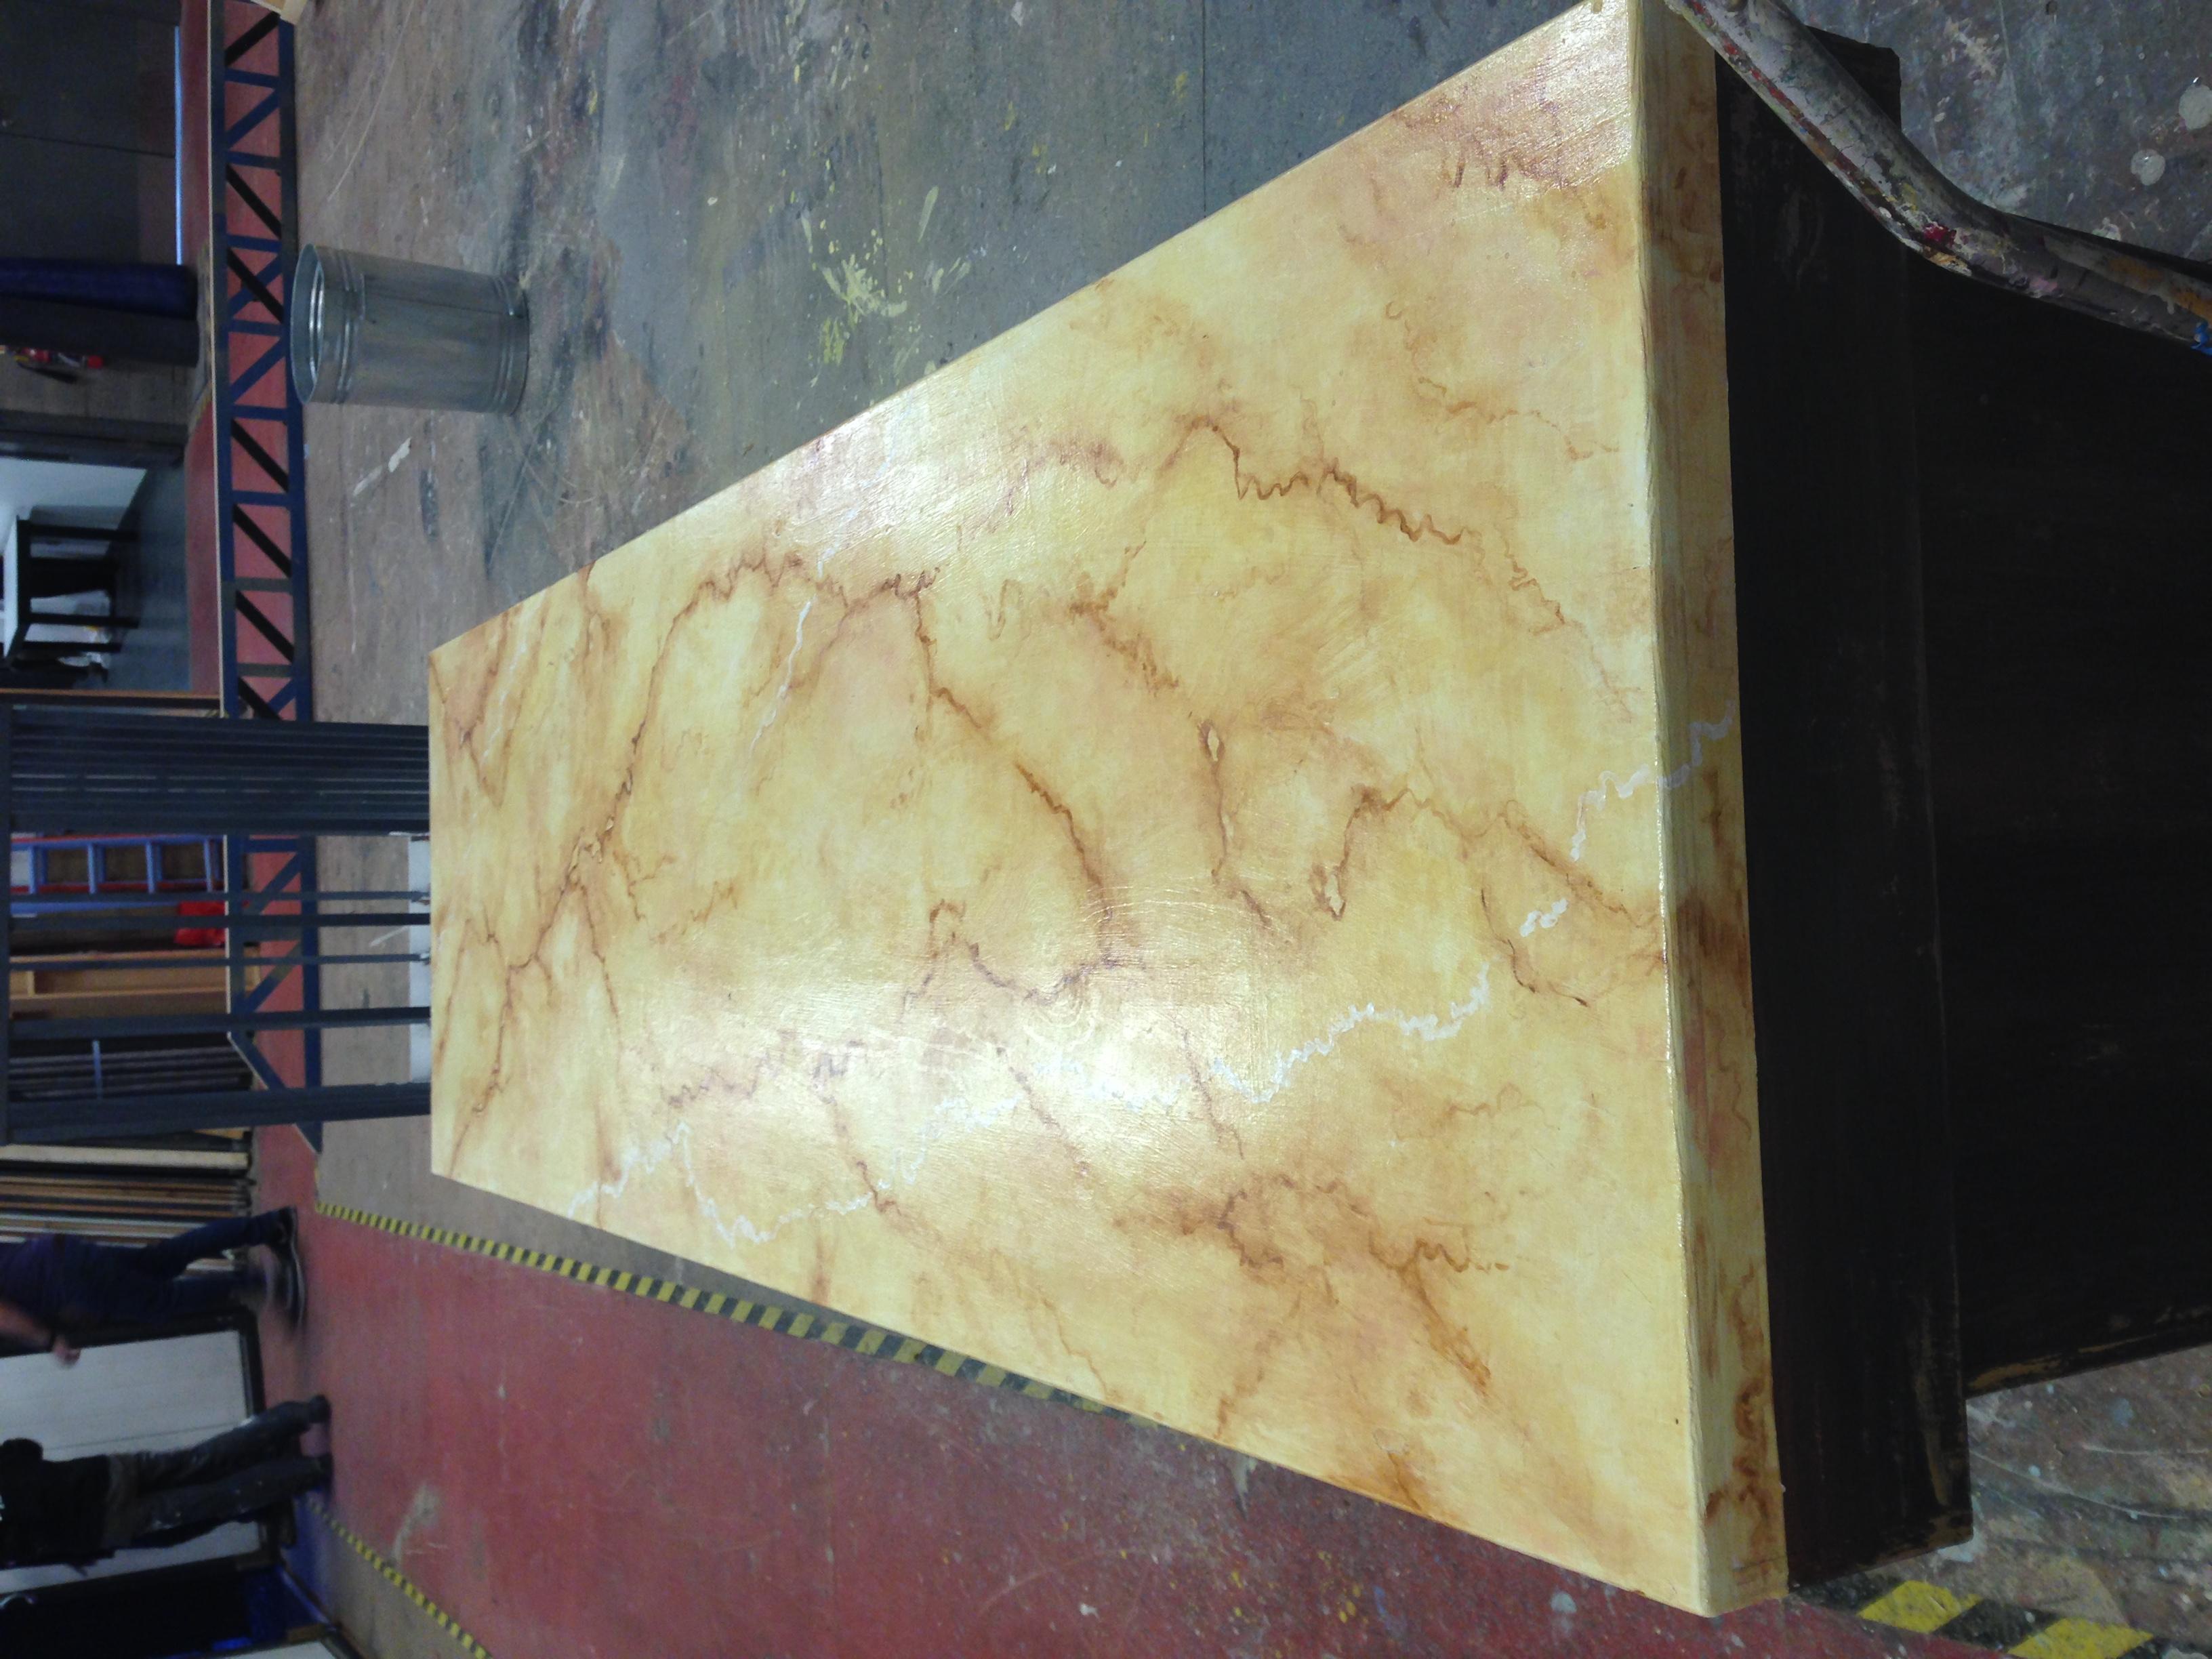 Effets marbres et bois